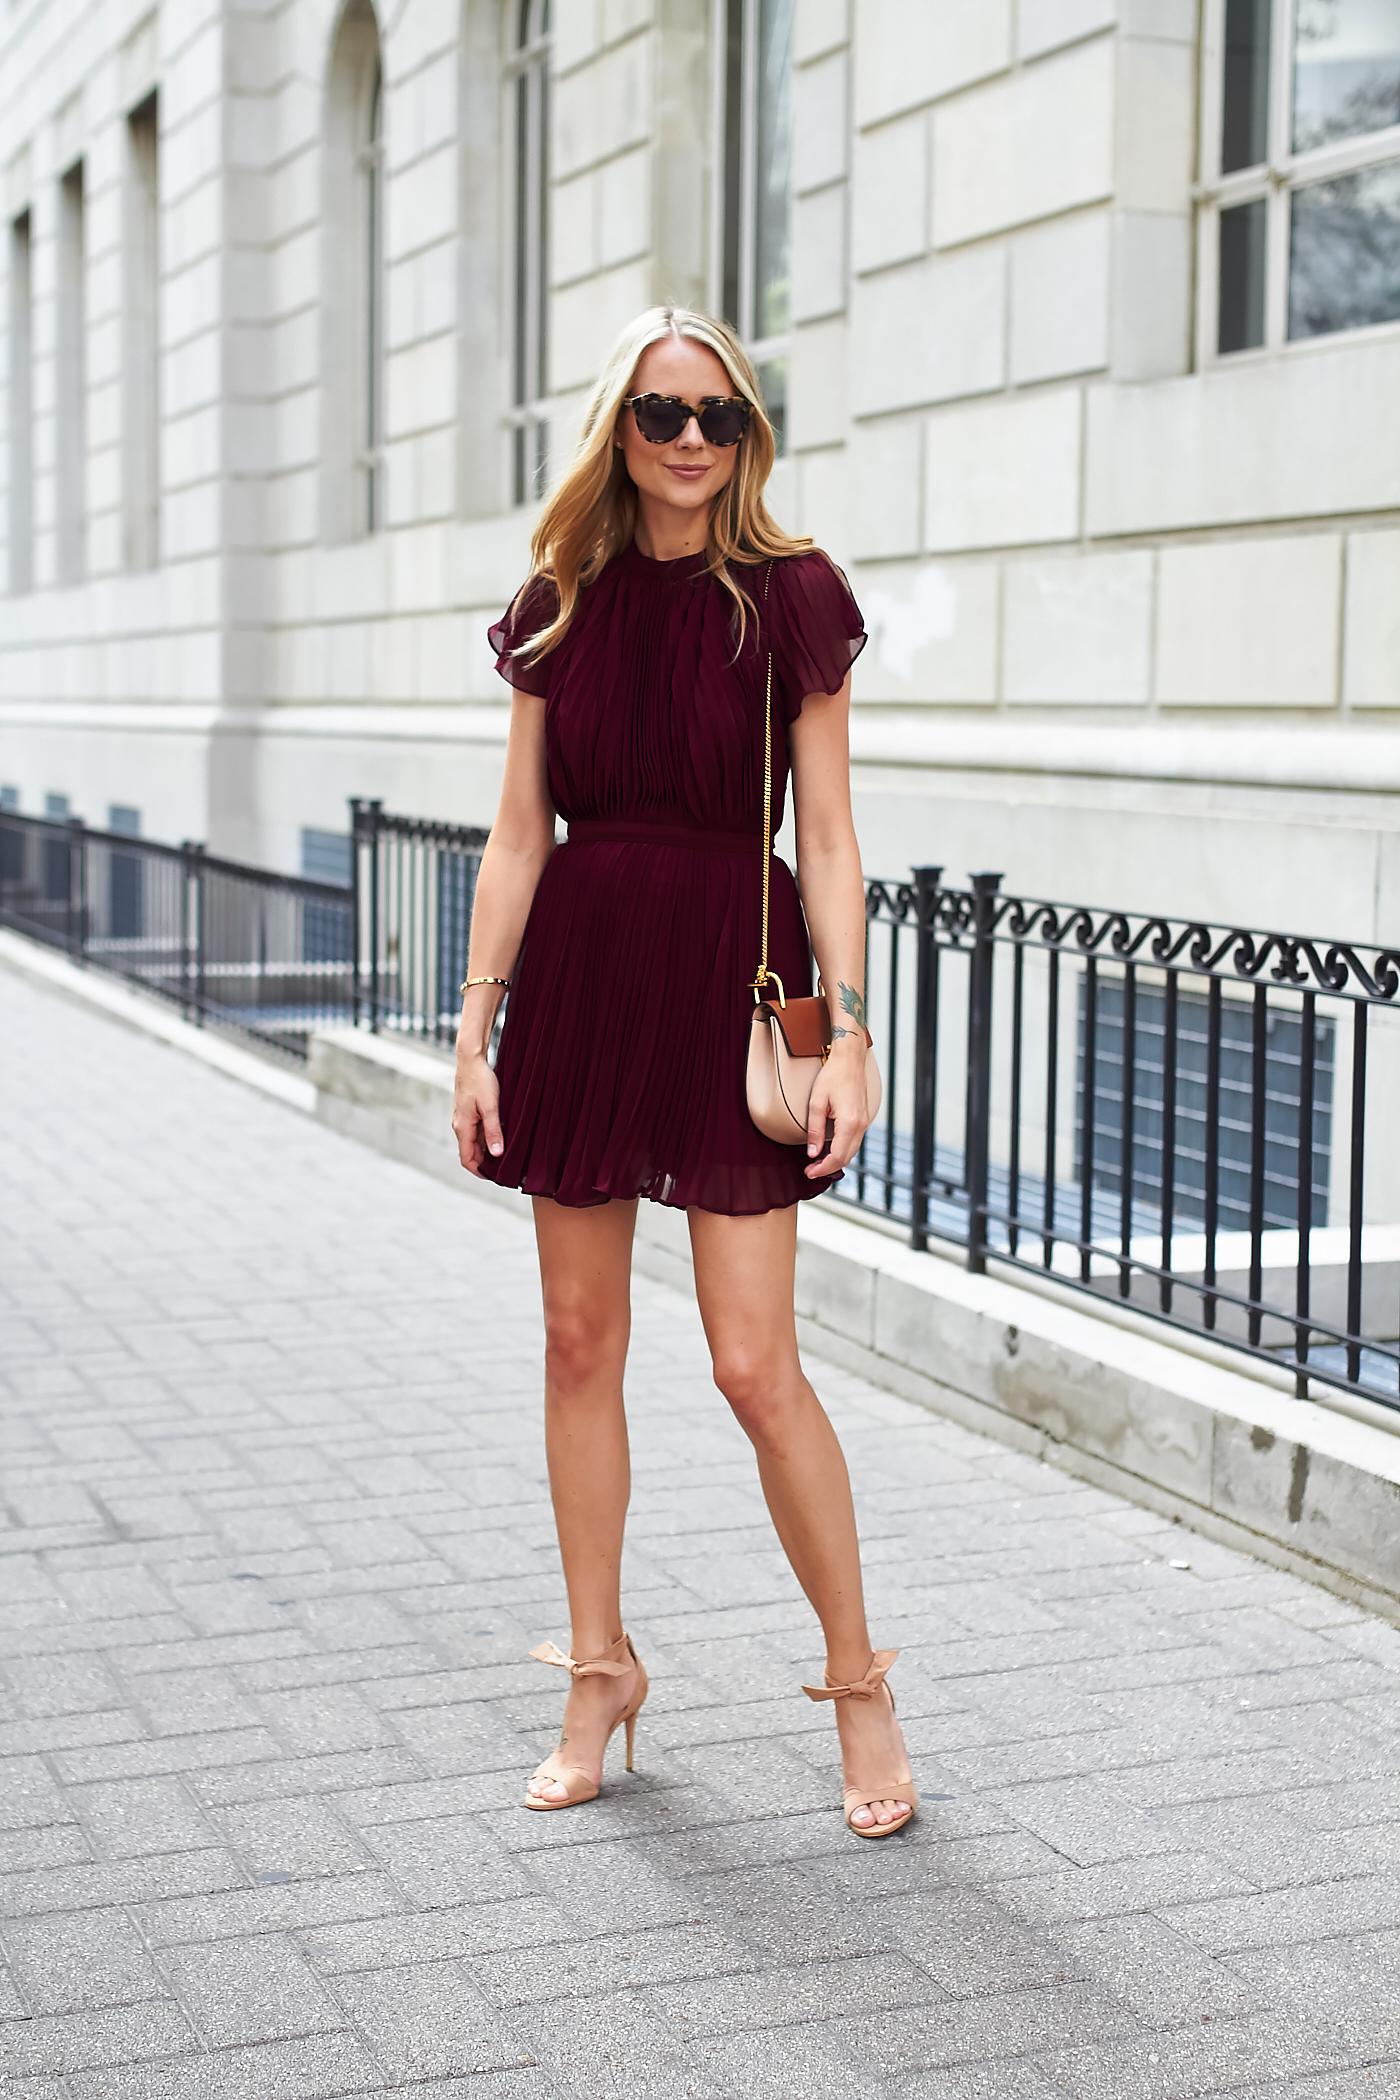 fashion-jackson-keepsake-come-back-pleated-dress-chloe-drew-handbag-steve-madden-bowwtye-heels